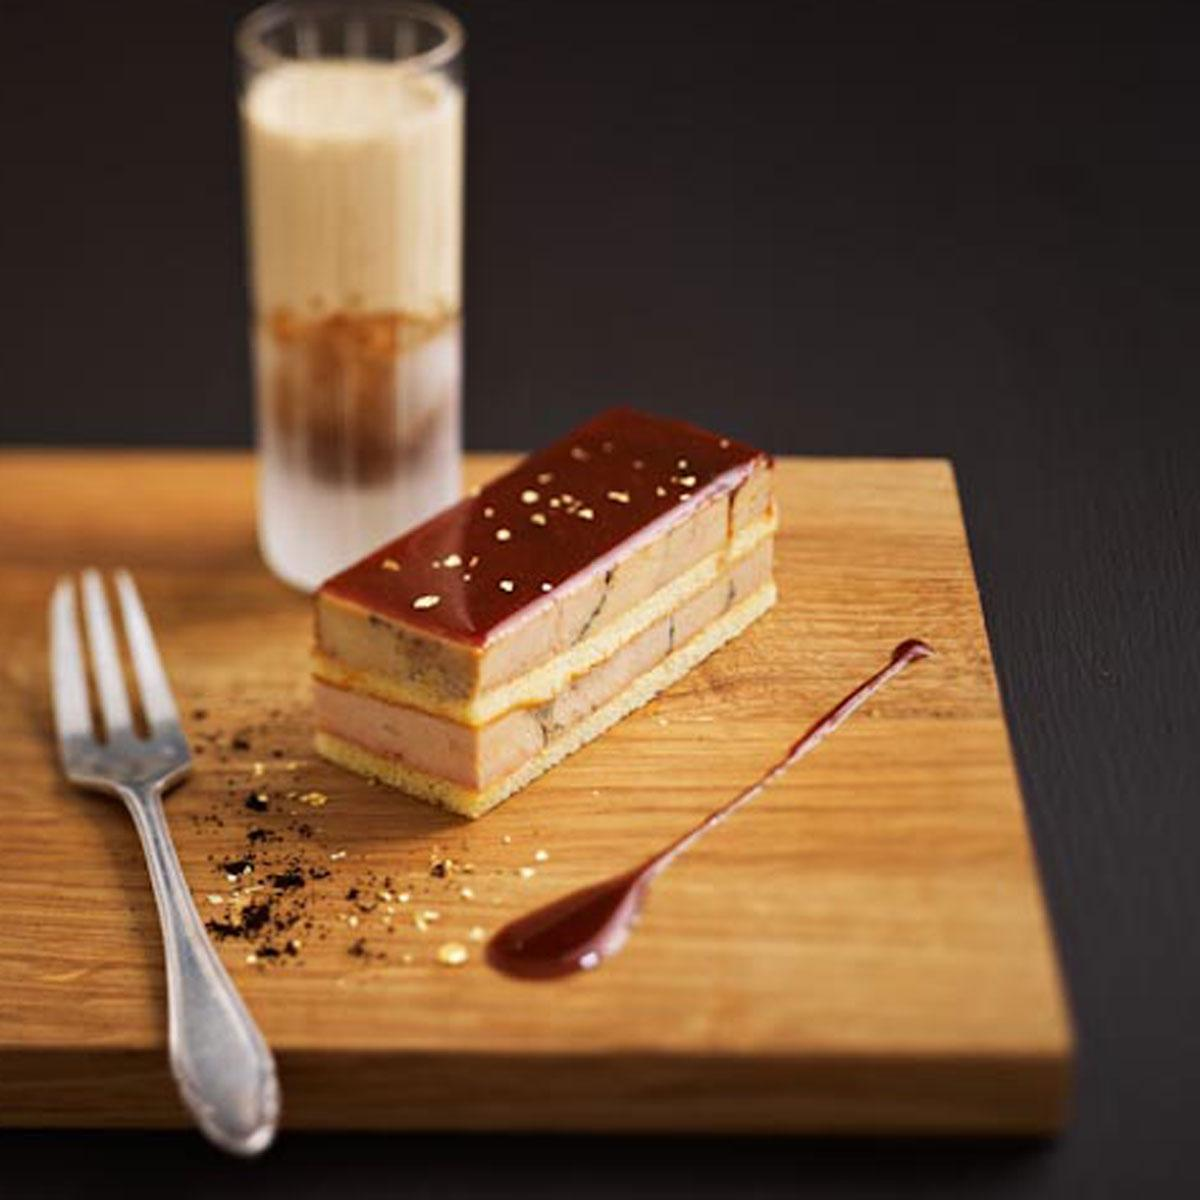 Recette op ra de foie gras cuisine madame figaro - Recette de foie gras ...